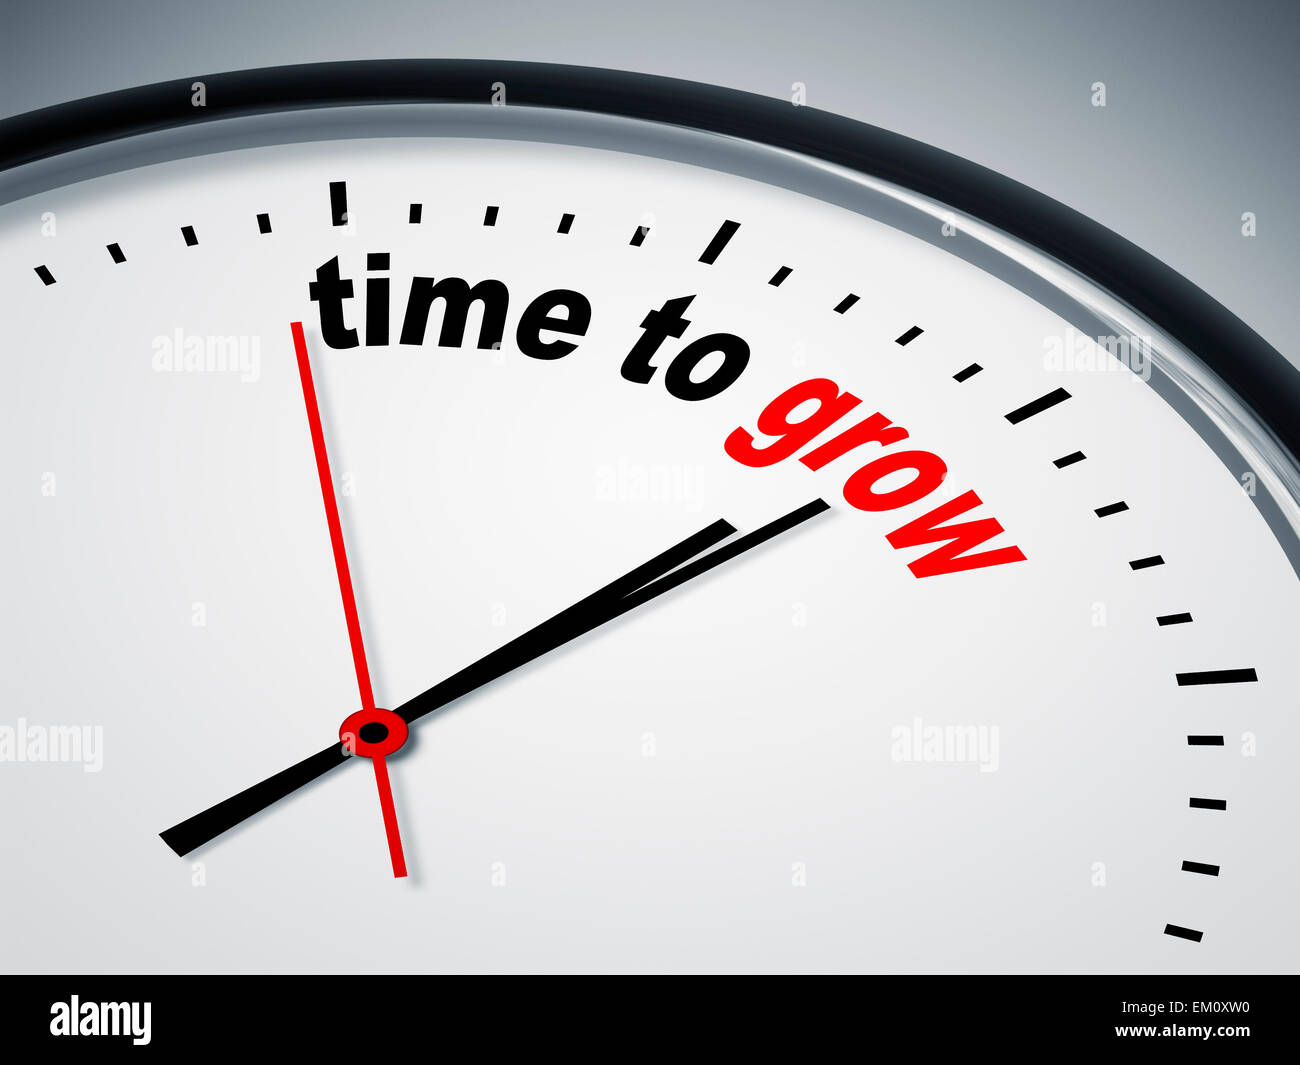 time to grow - Stock Image